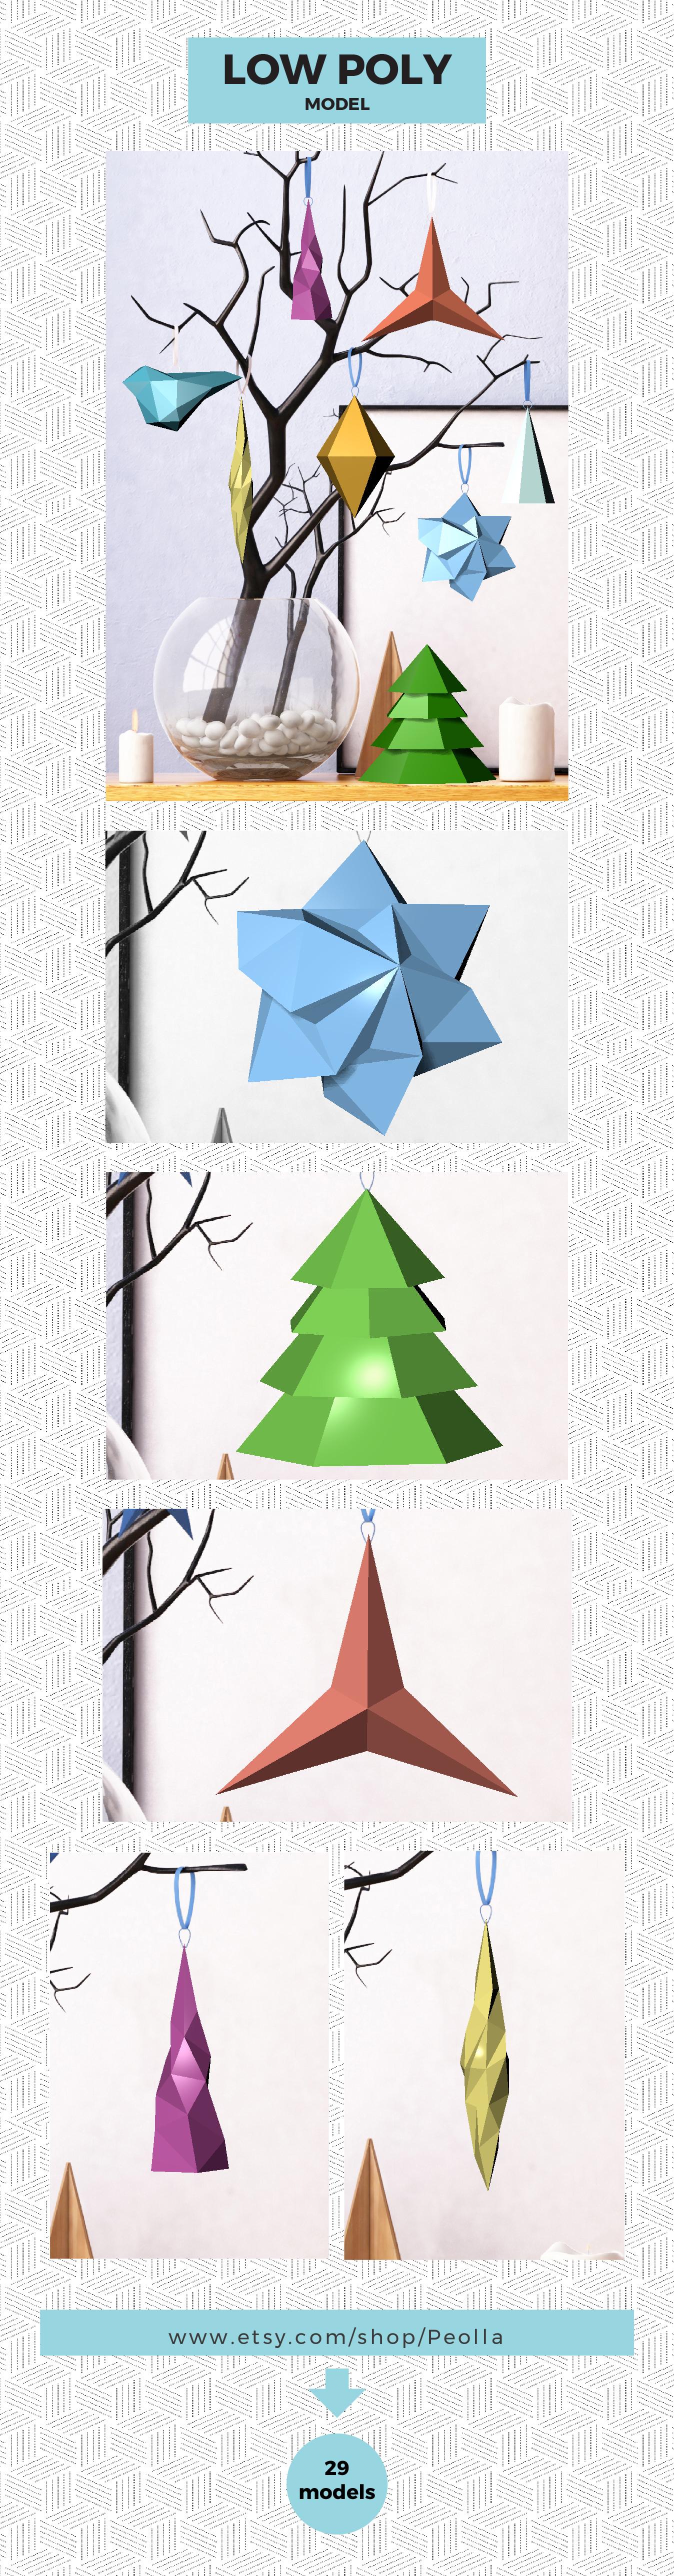 Printable Diy Template Pdf Christmas Decorations Low Poly Etsy Diy Printables Christmas Baubles Diy Template